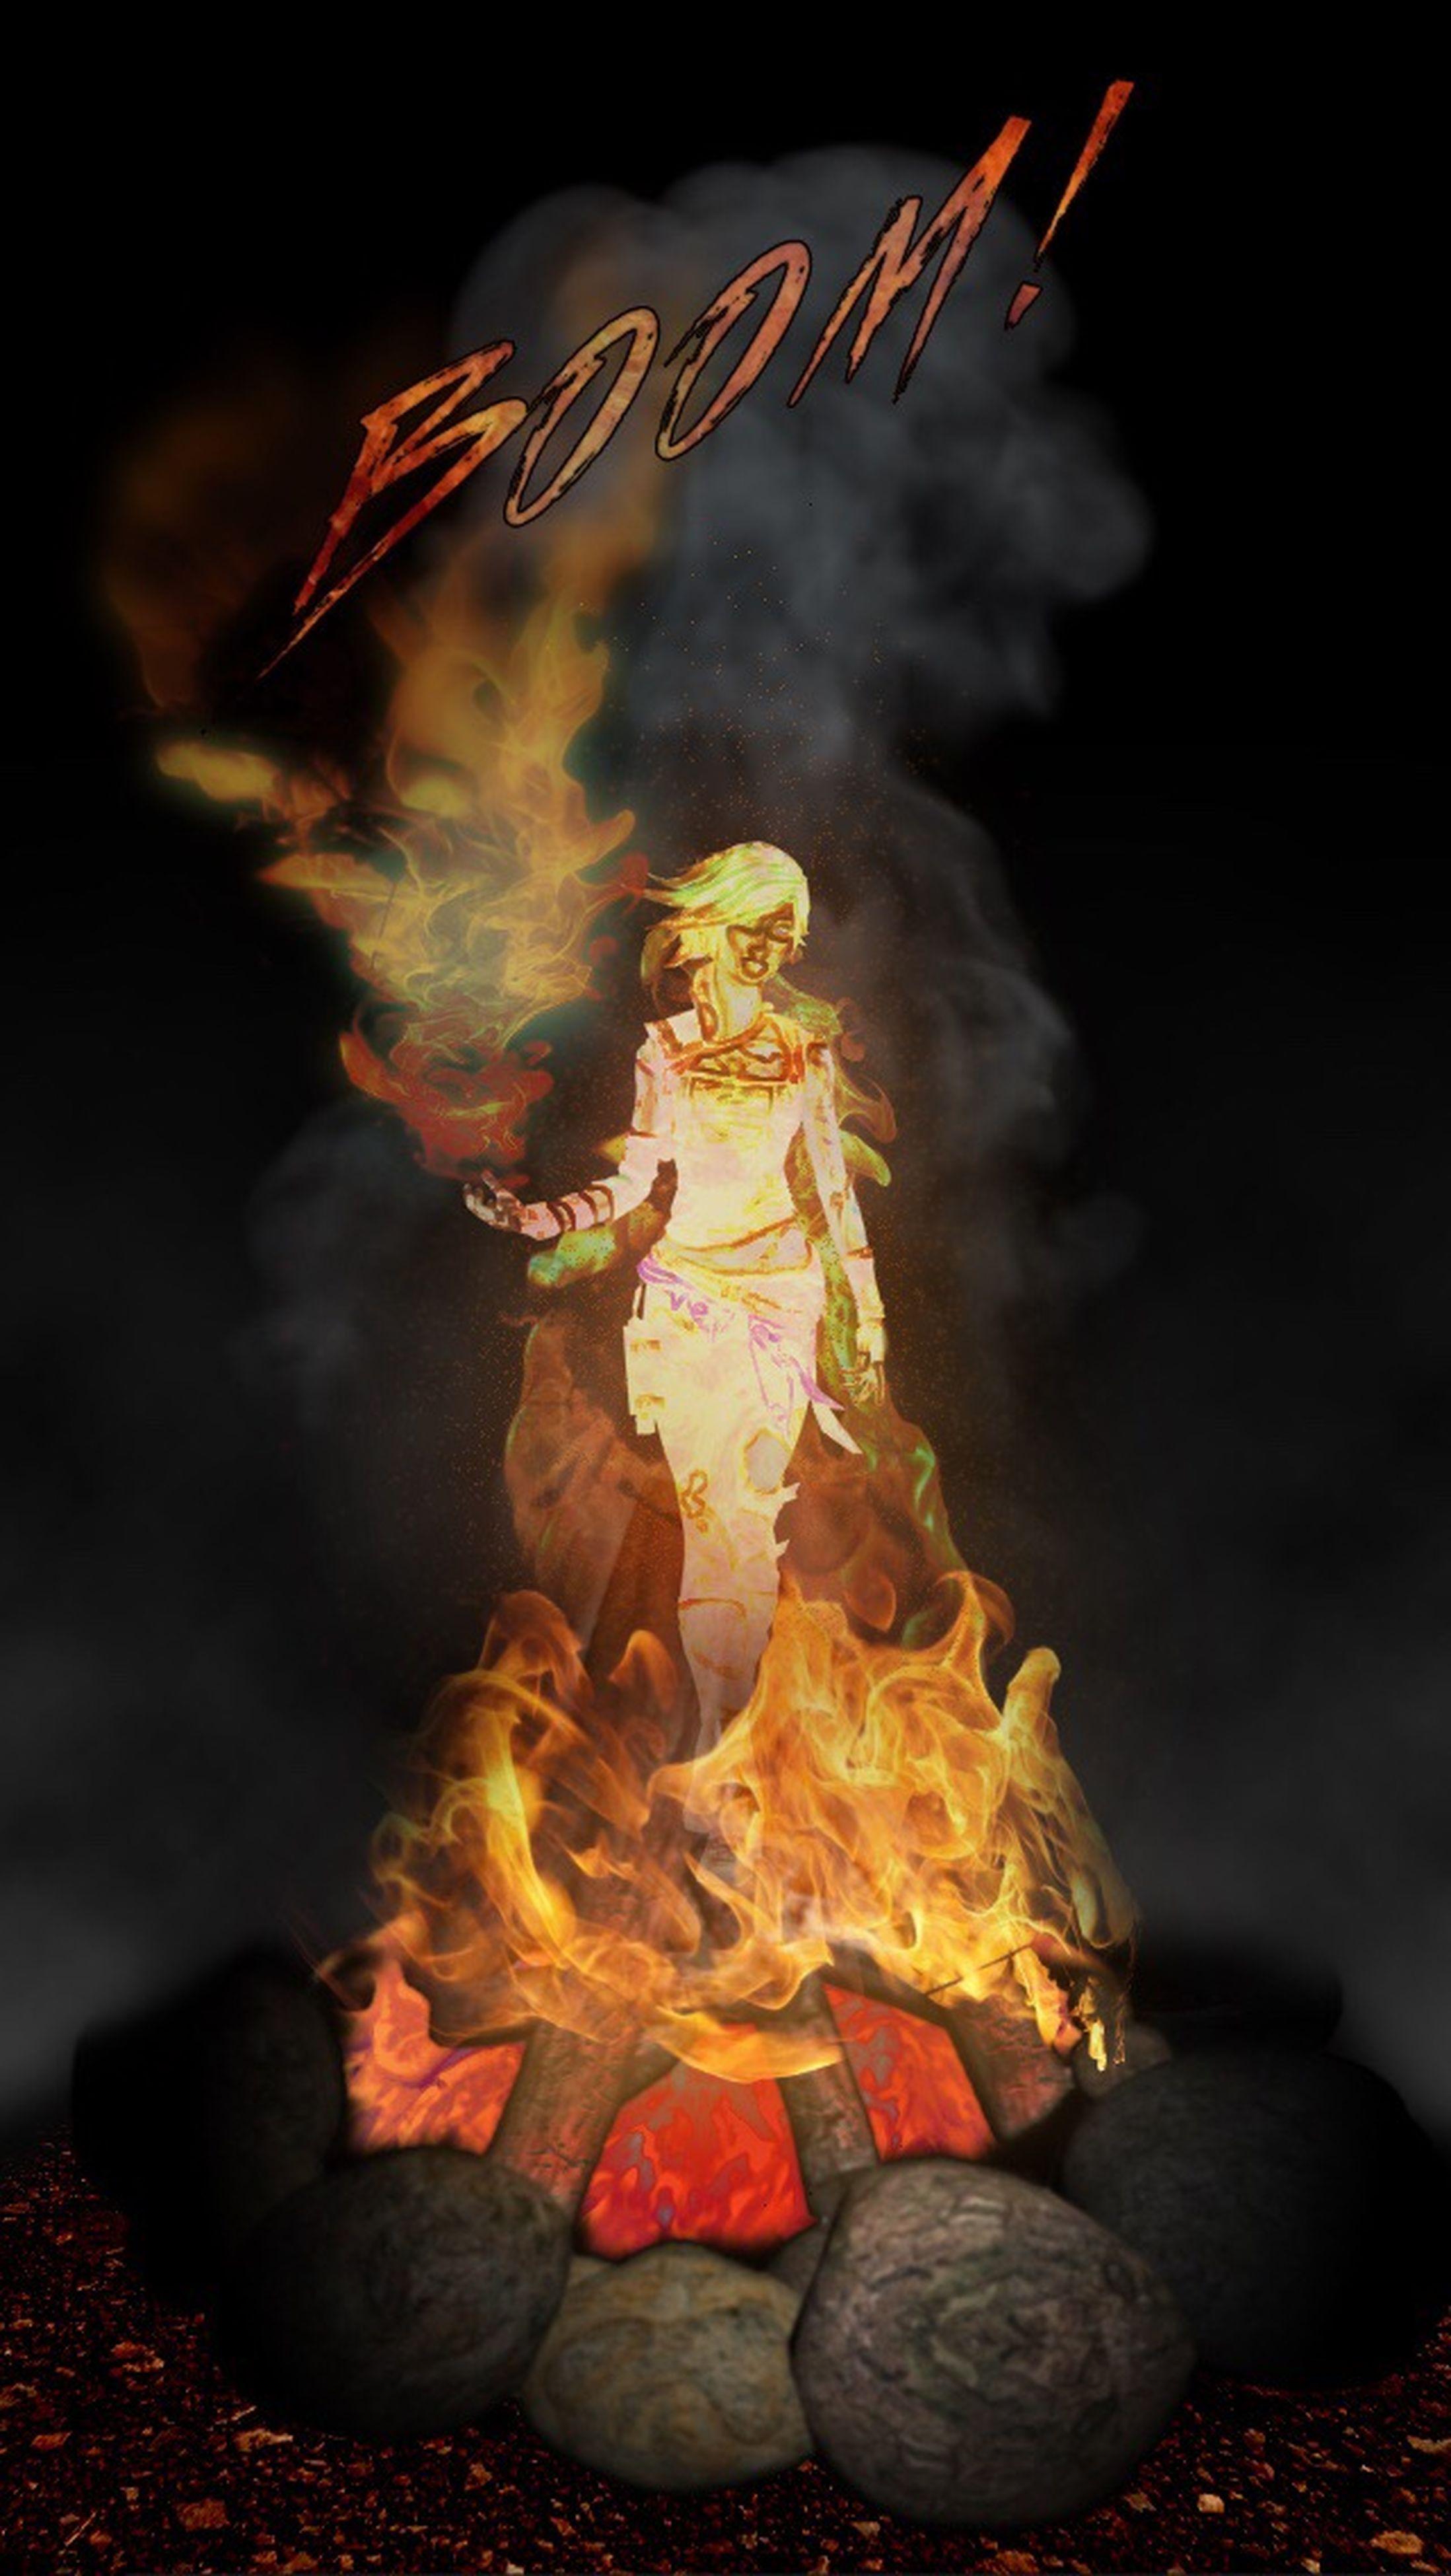 burning, flame, fire - natural phenomenon, heat - temperature, night, glowing, fire, bonfire, illuminated, smoke - physical structure, close-up, campfire, heat, celebration, smoke, motion, firewood, outdoors, spirituality, danger